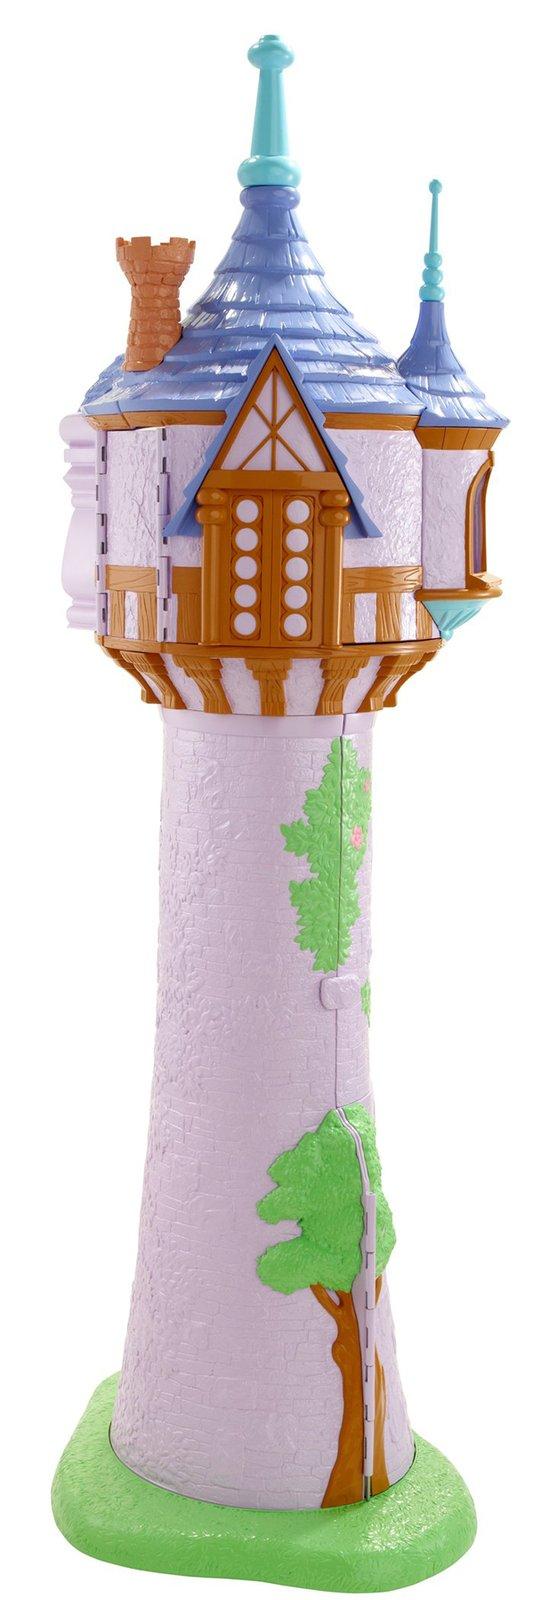 Tower clipart rapunzels #5